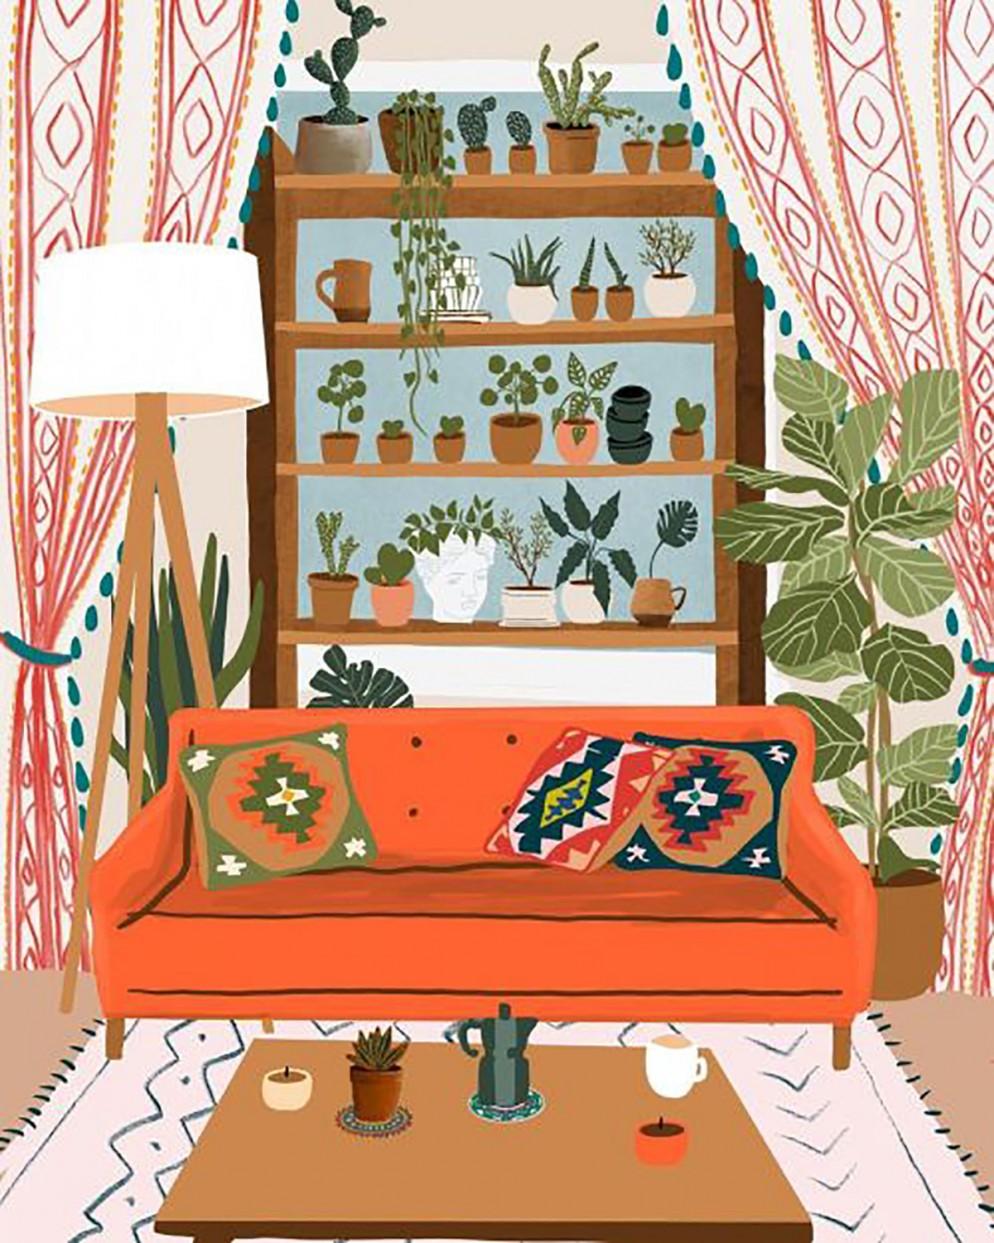 Ceyda-Alasar-illustratori_living-corriere  (7)